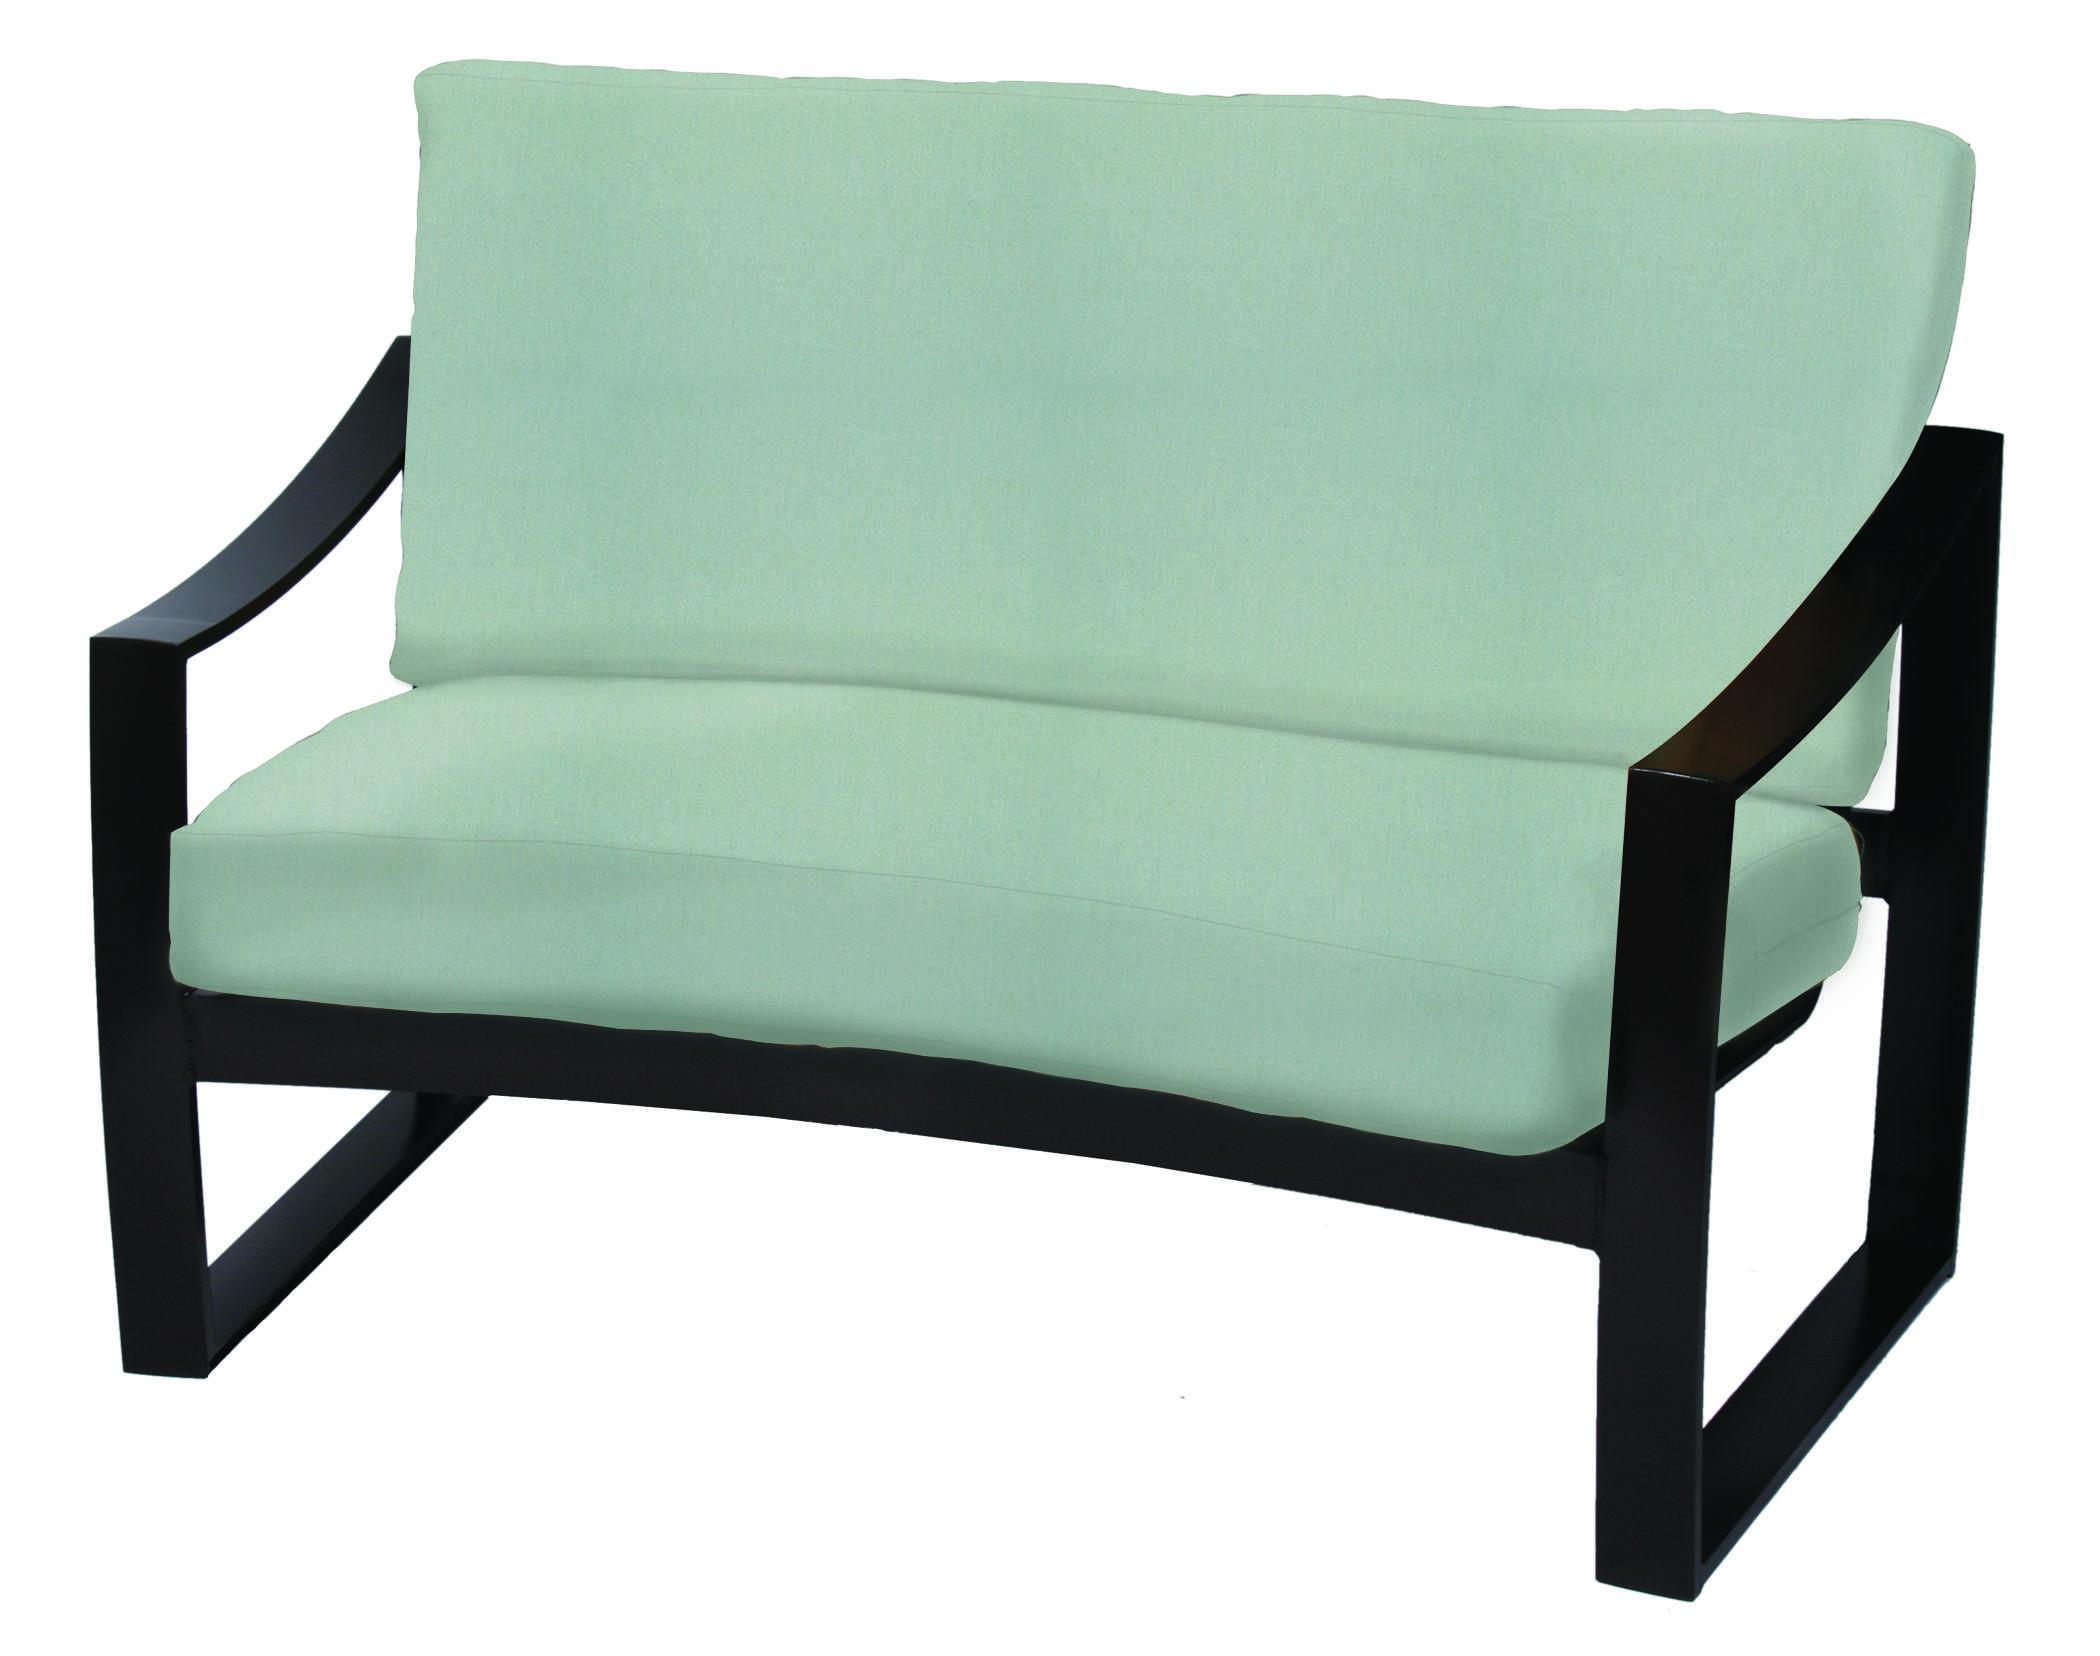 Suncoast pinnacle cushion aluminum conversation lounge set pincst - Conversation set replacement cushions ...